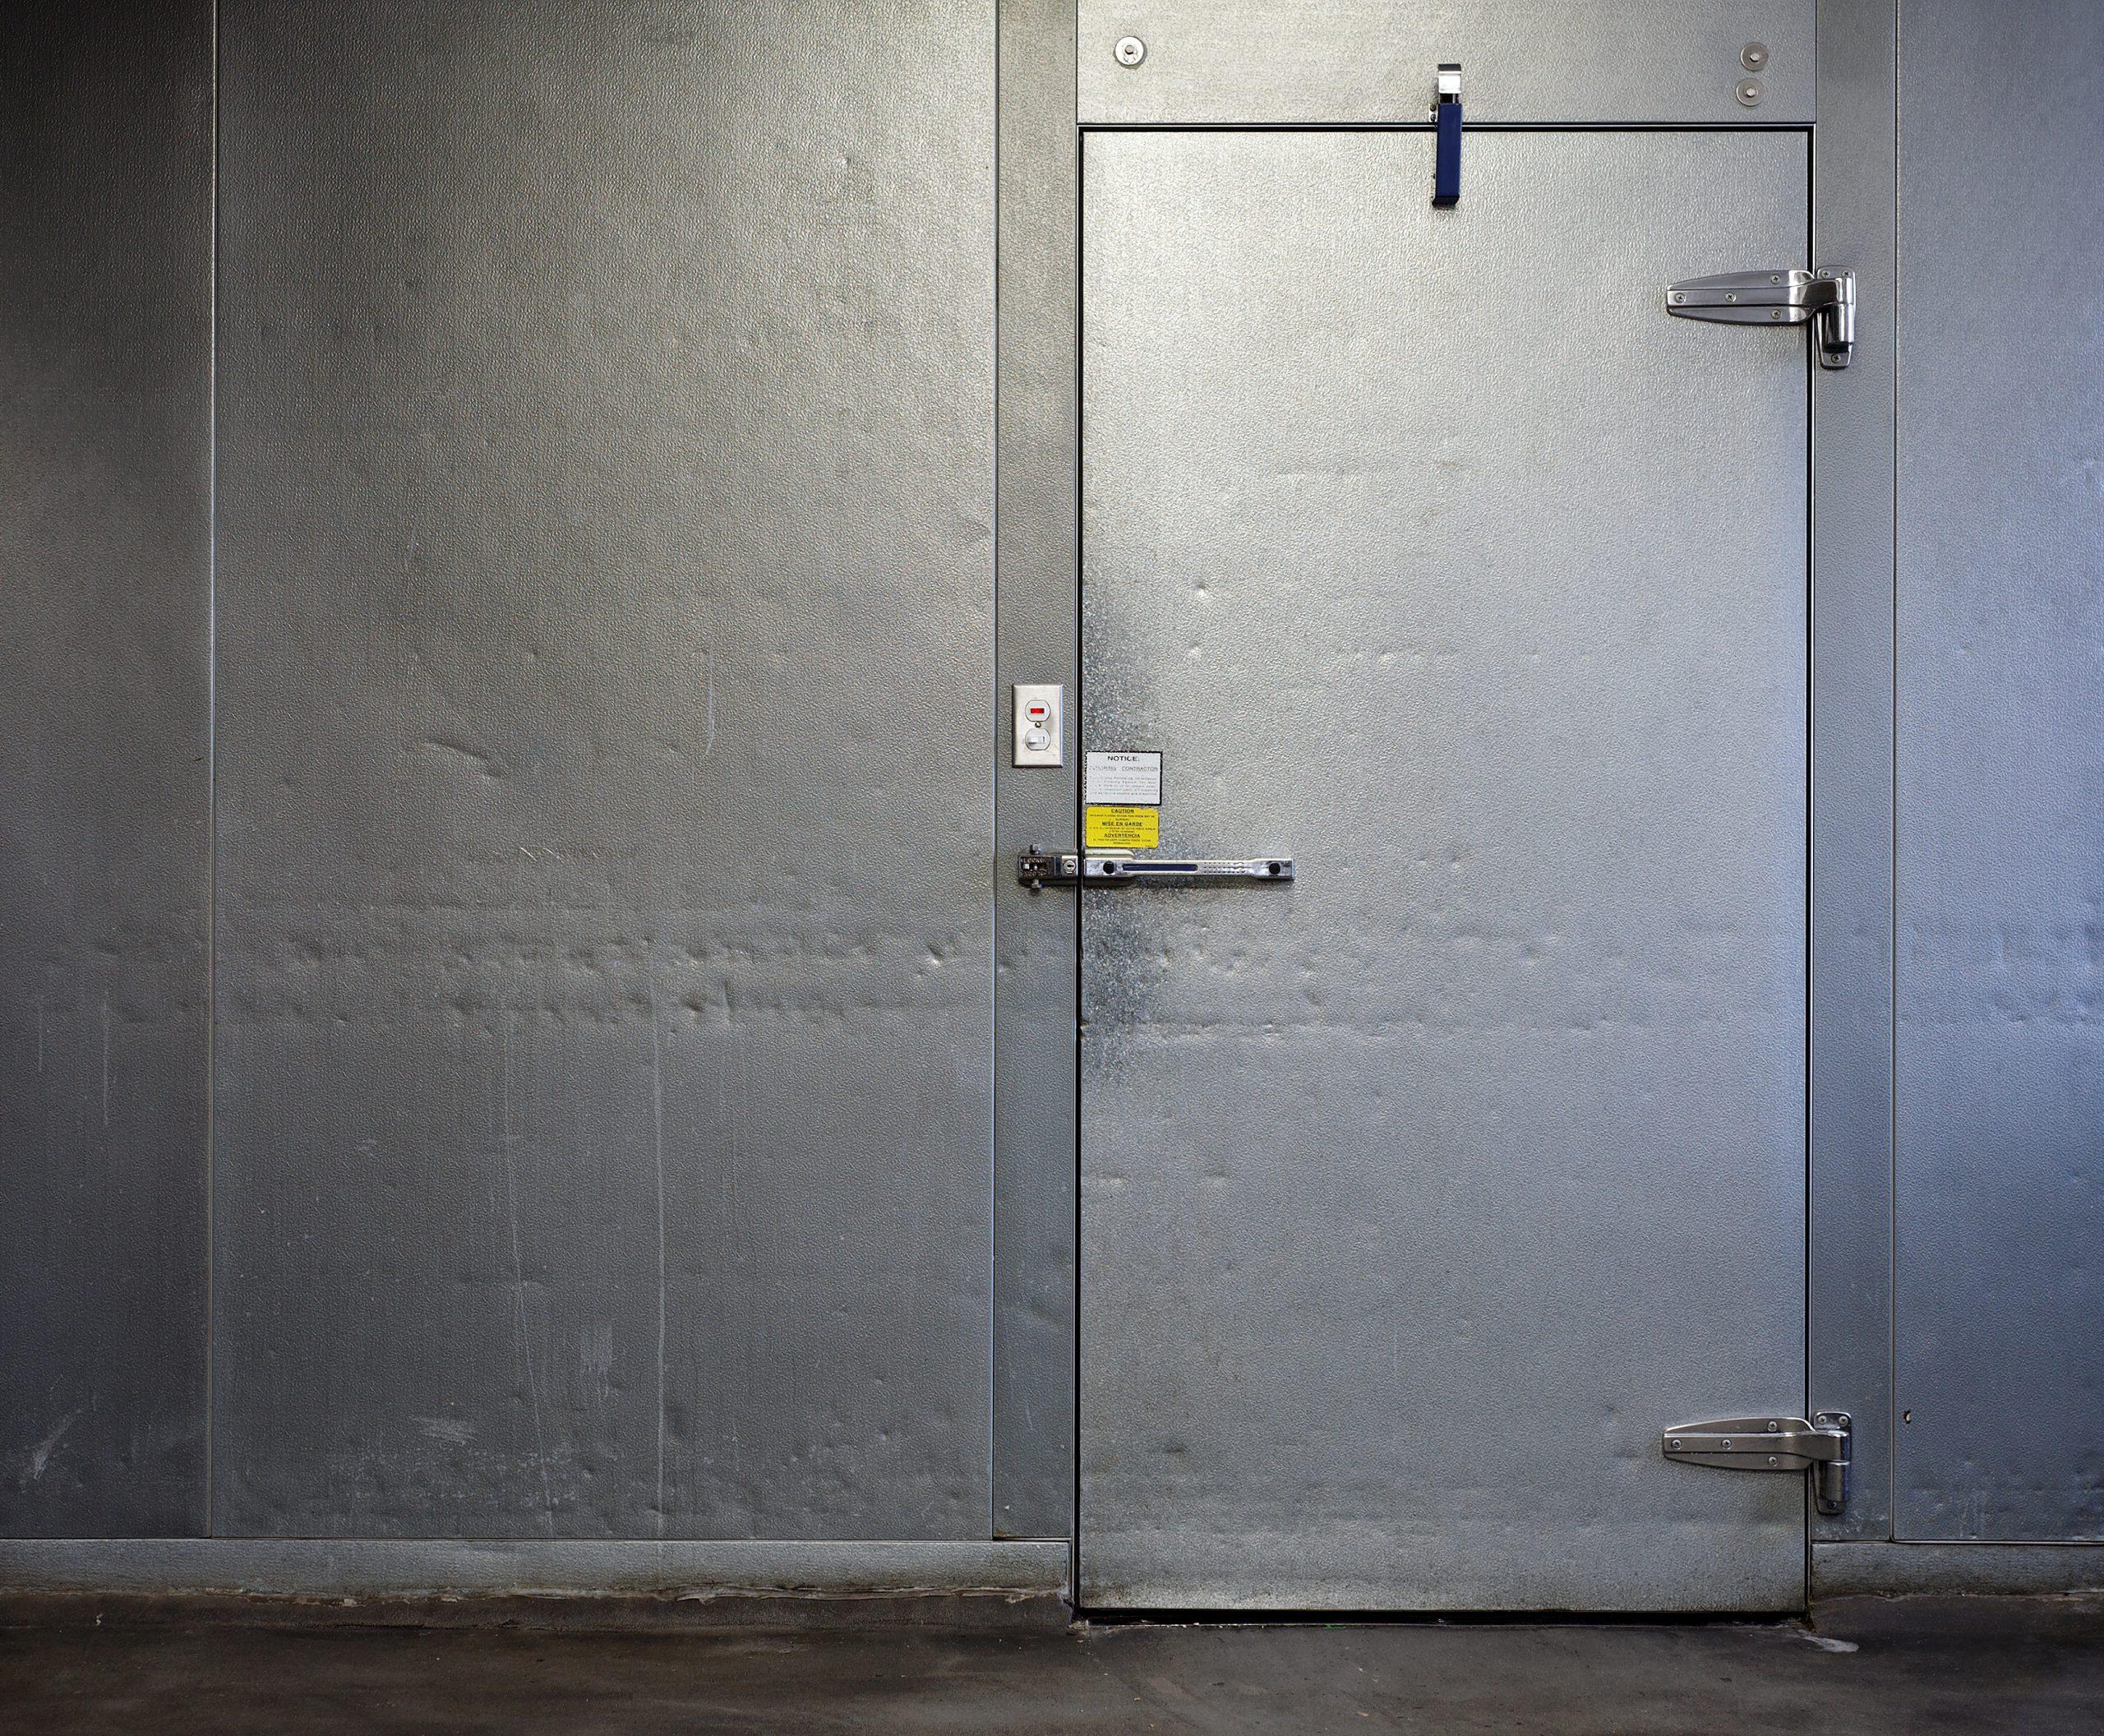 commercial refrigeration walkin cooler repair